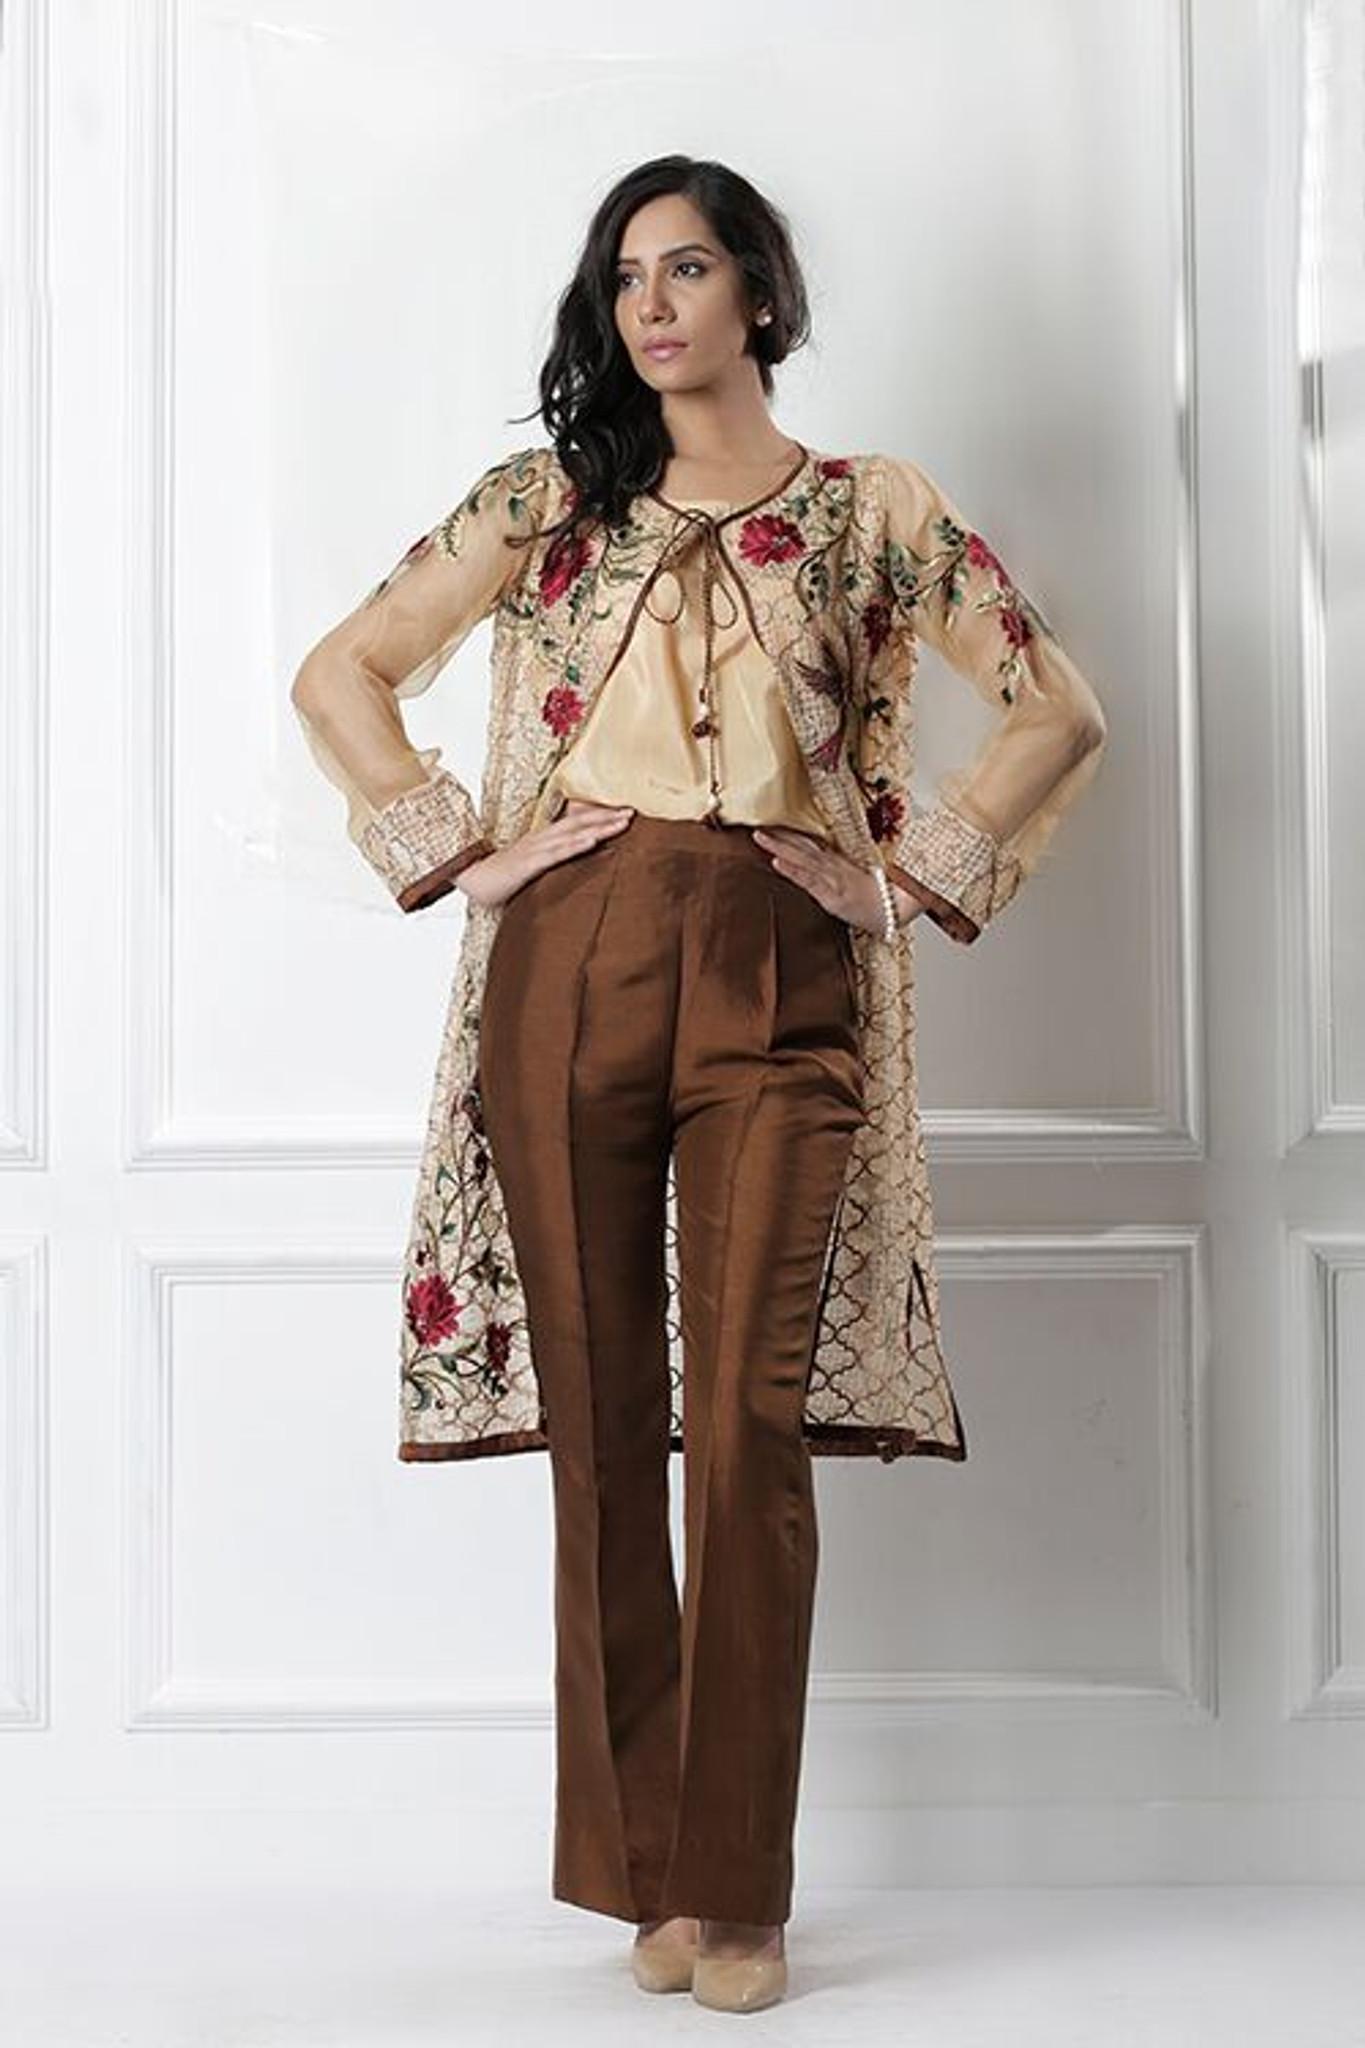 Jeem 3 Piece Outfit